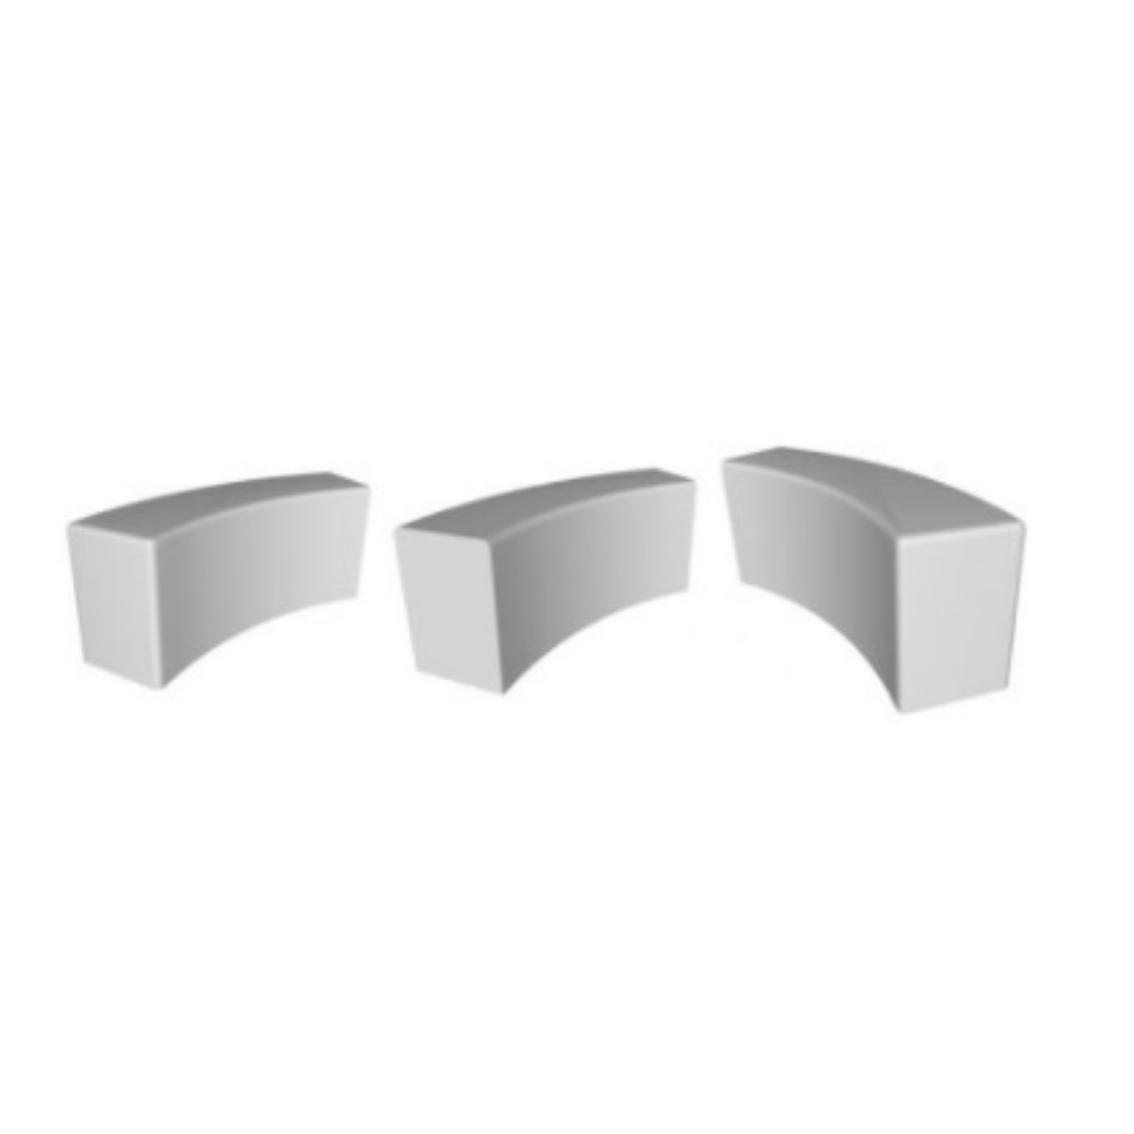 Pendlebury Modular Curved Concrete Bench